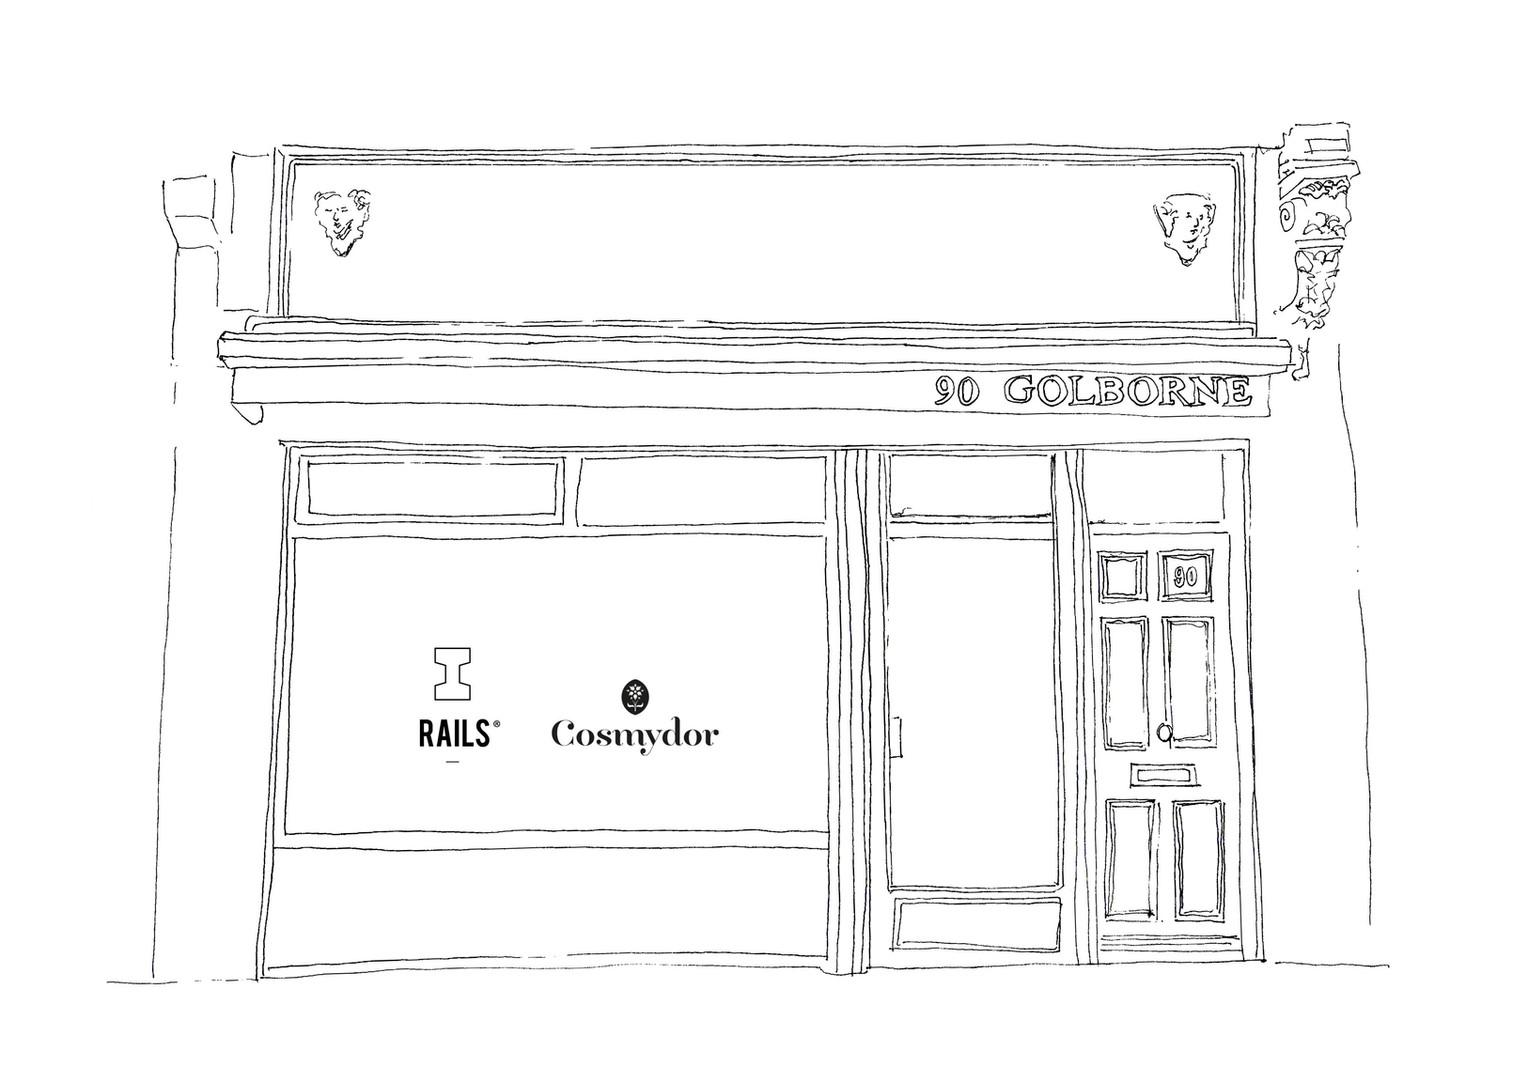 RAILS Pop-Up store Golborne Road-Portobello London